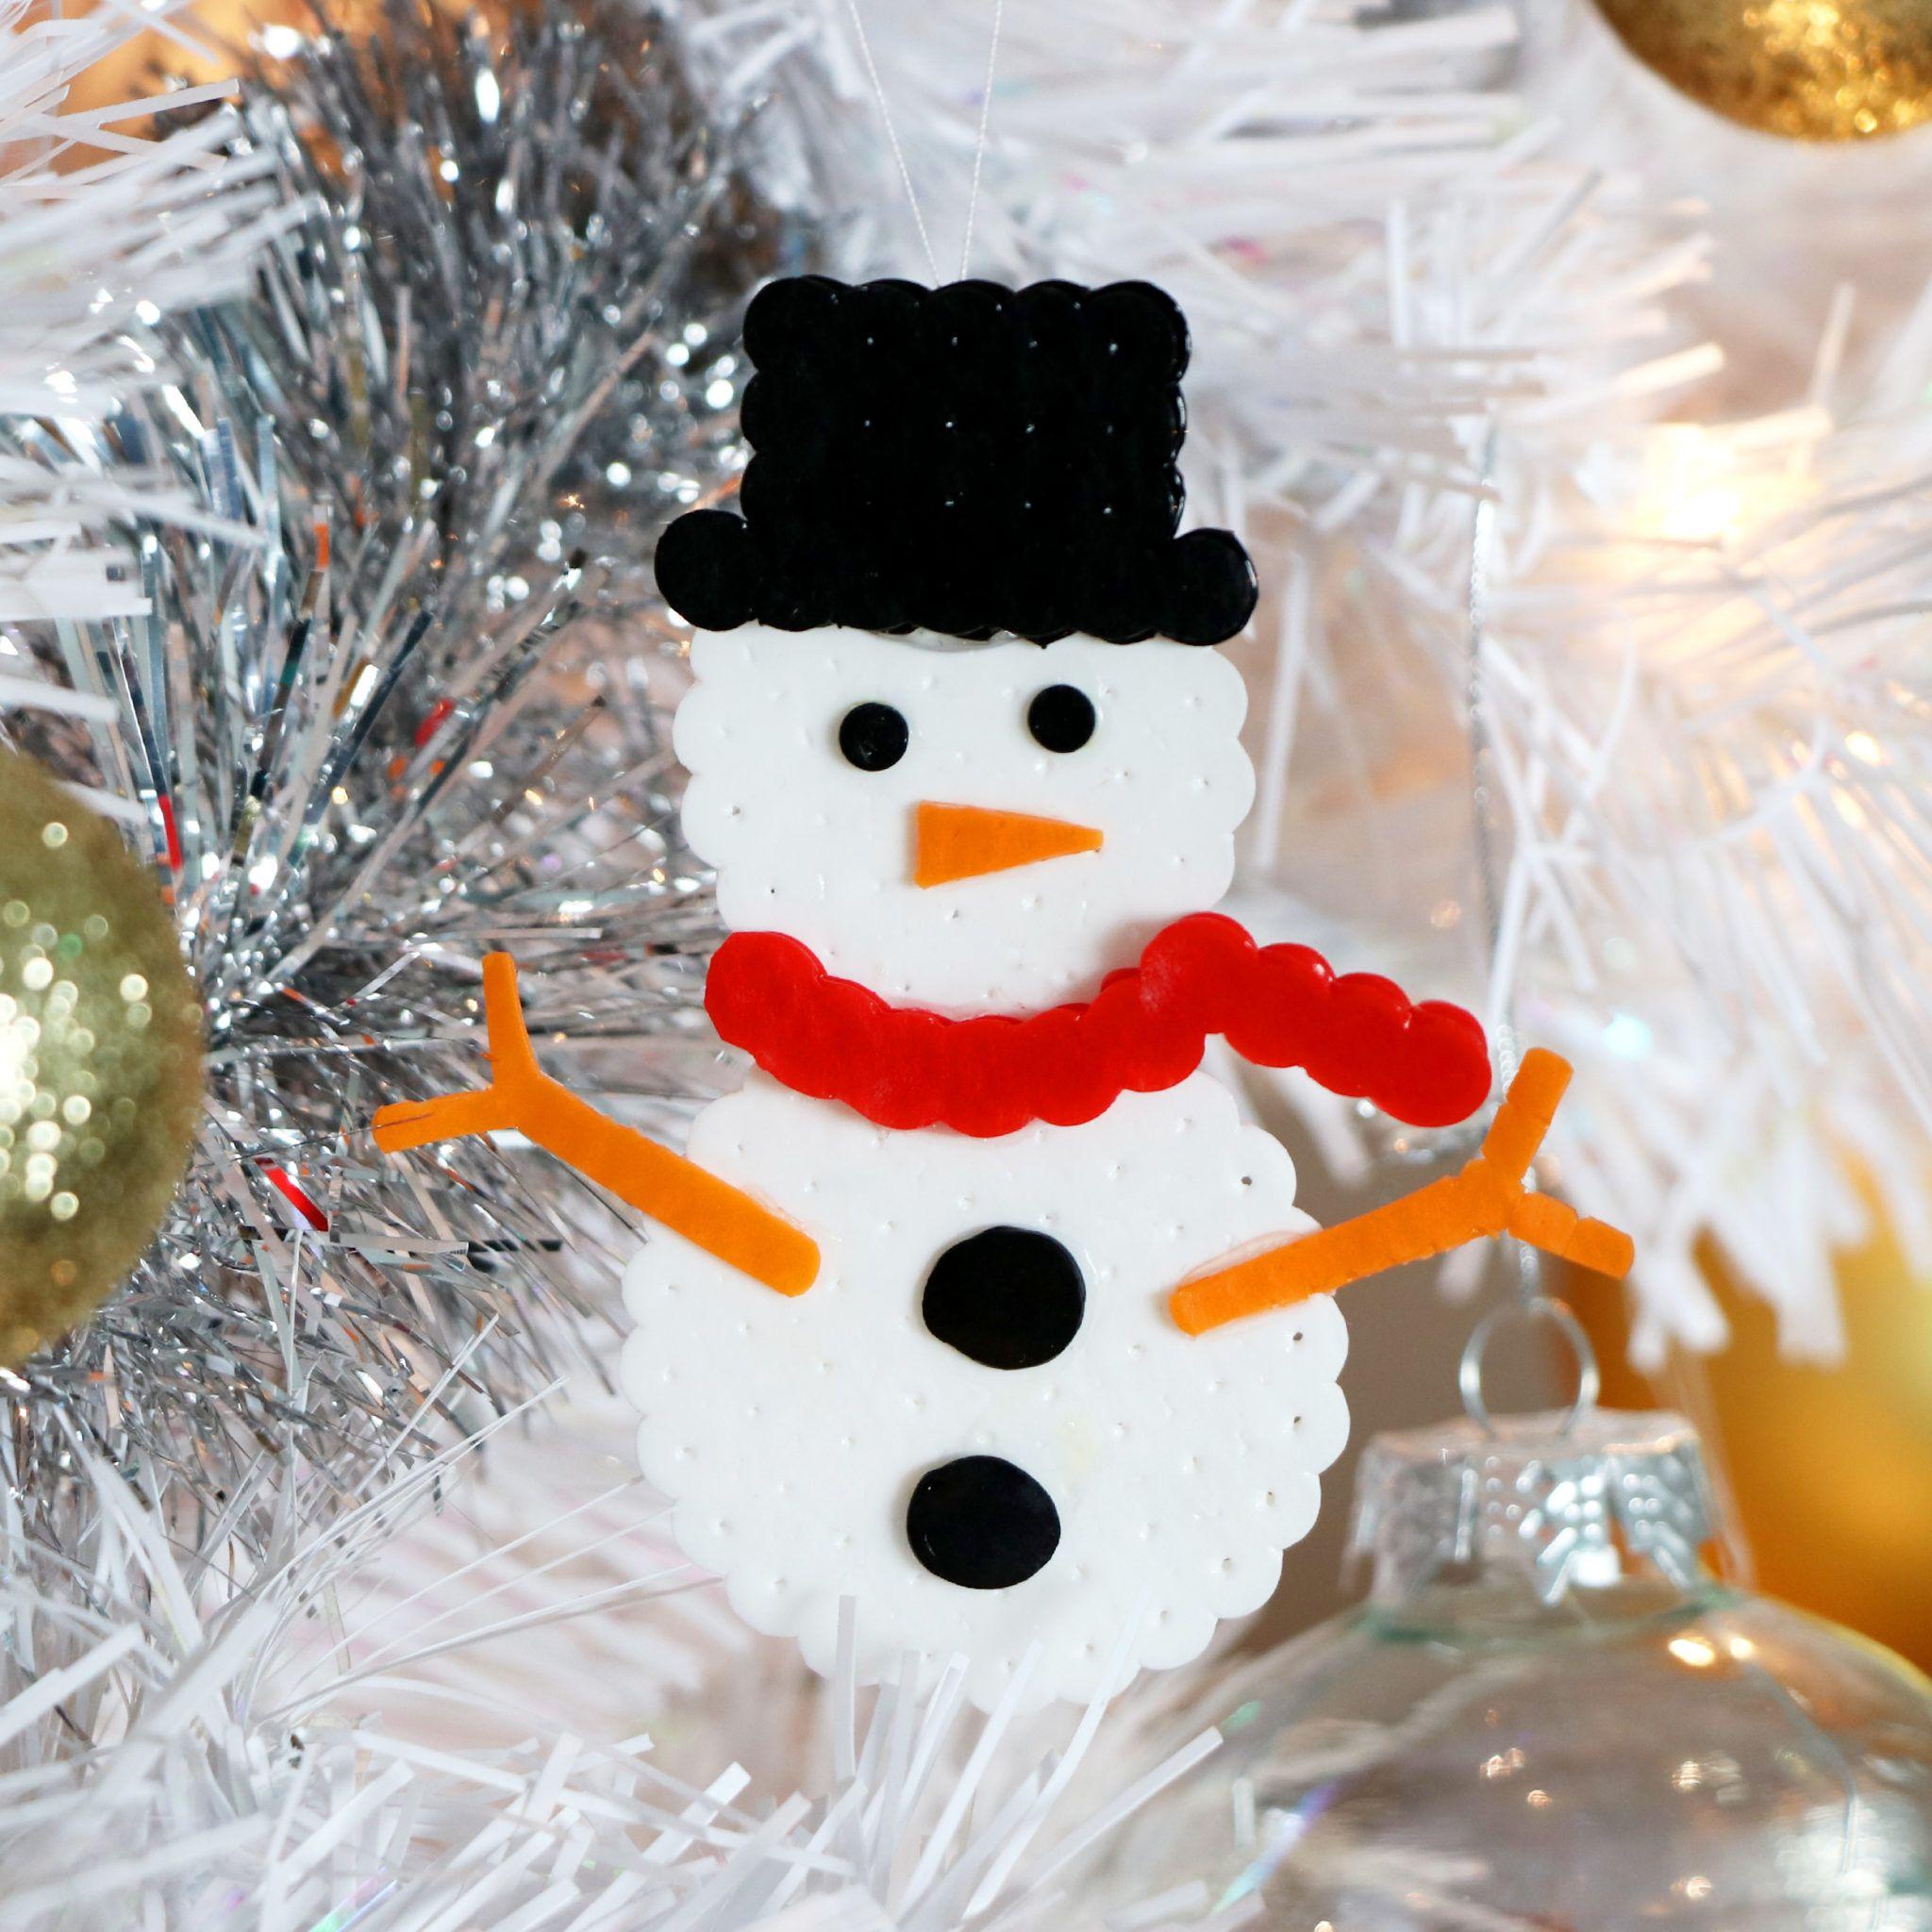 Diy Cute Layered Perler Bead Snowman Christmas Tree Ornament Handmade Holiday Home Decor Id Beaded Christmas Ornaments Christmas Ornaments Handmade Ornaments